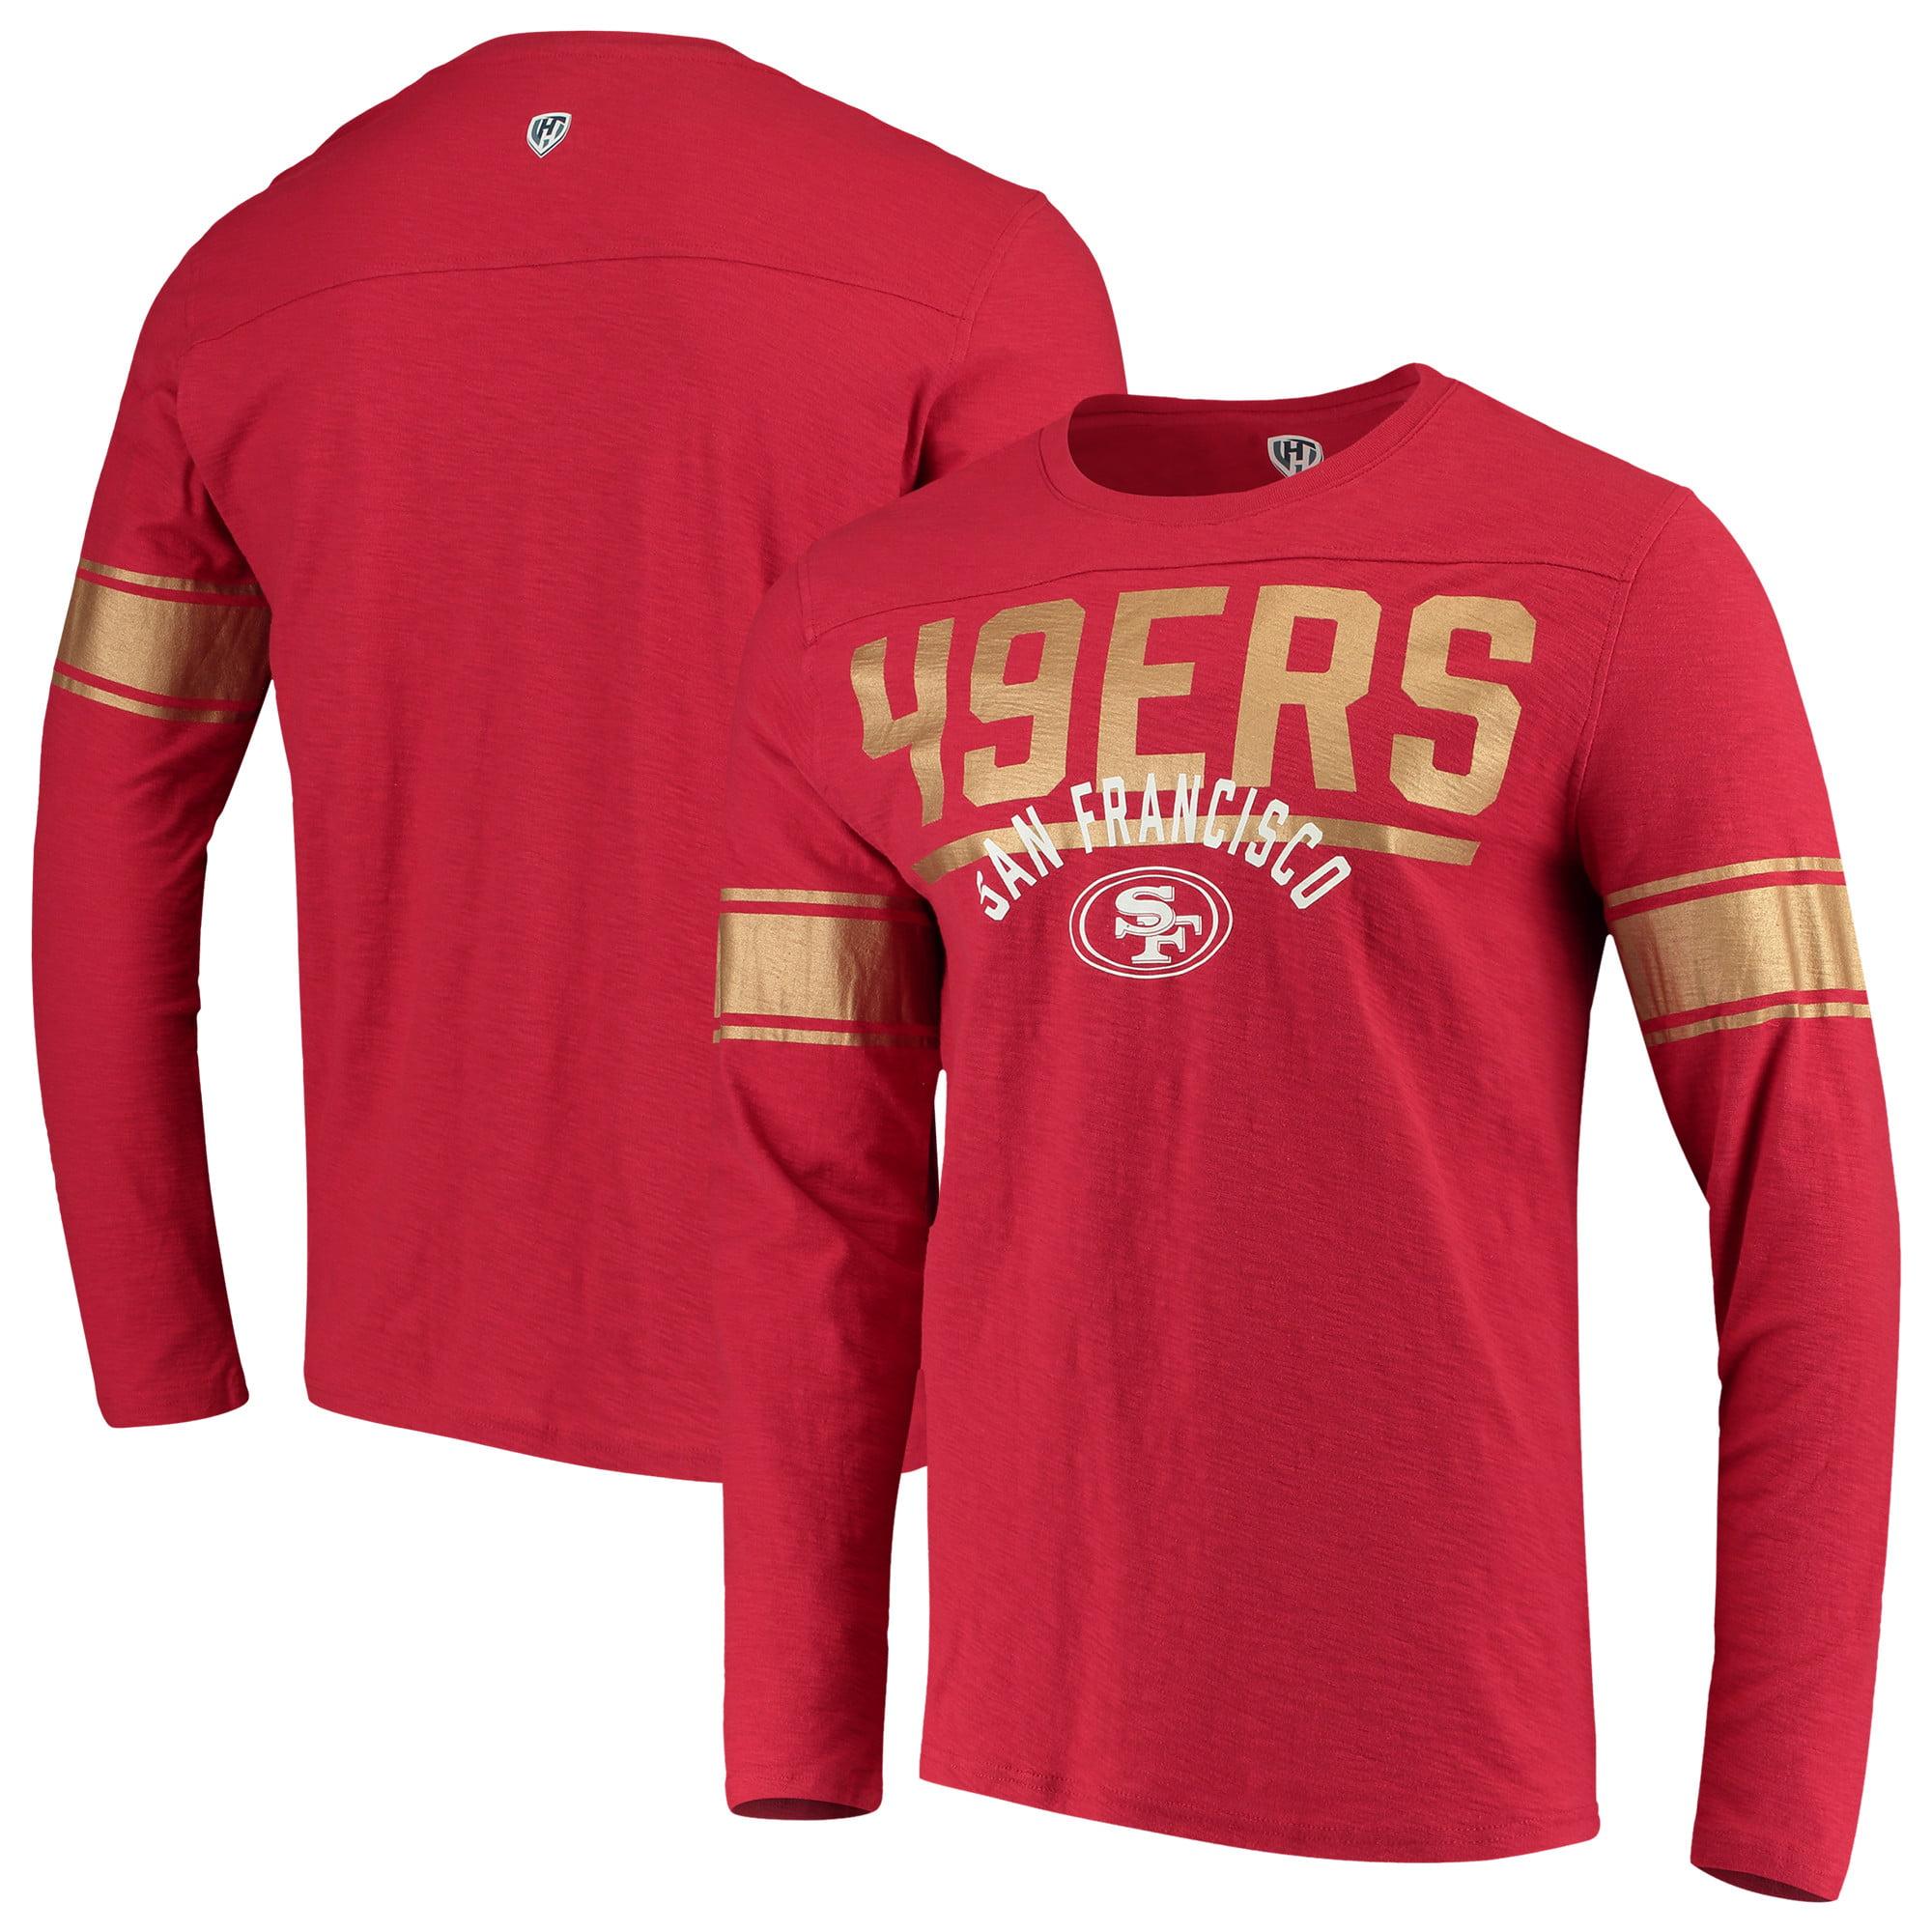 San Francisco 49ers Hands High Champion Slub Long Sleeve T-Shirt - Scarlet